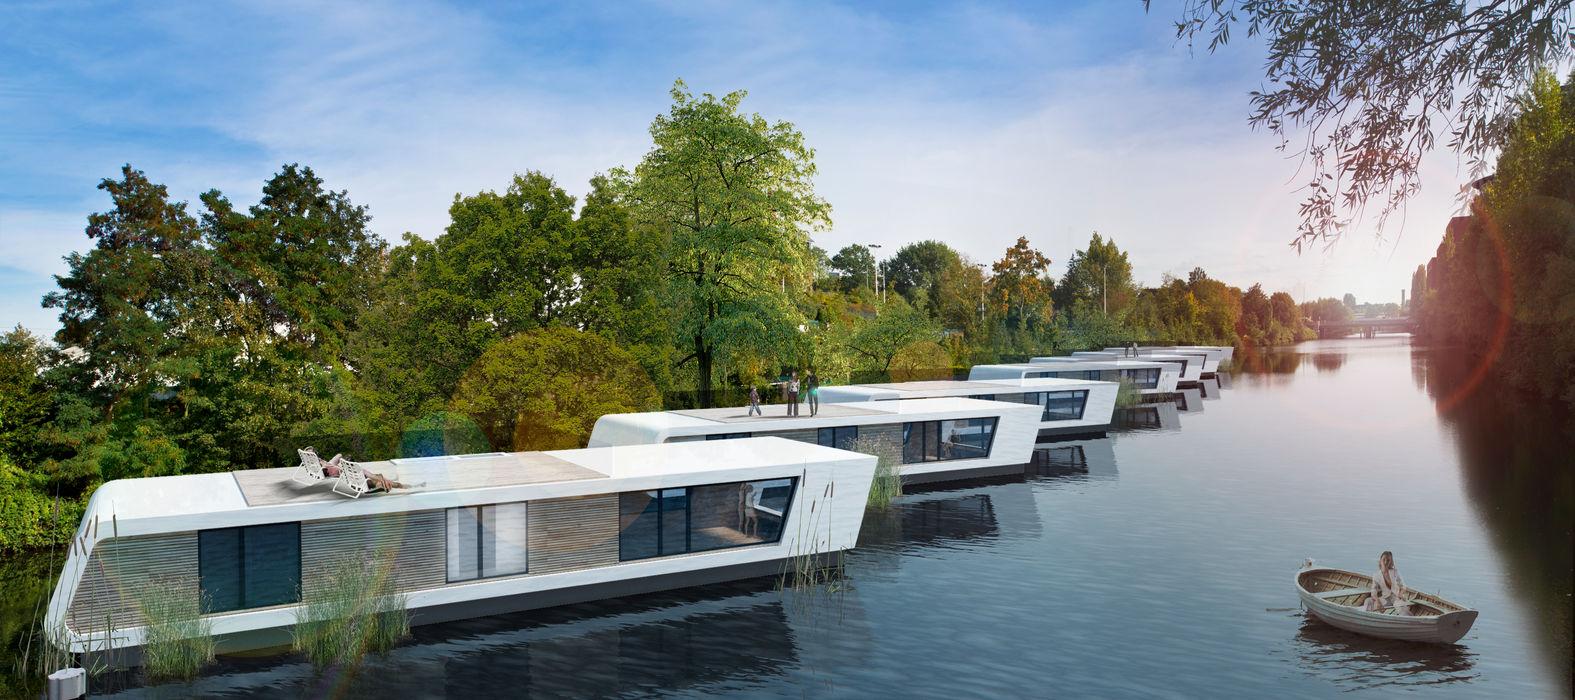 Floating Homes GmbH Habitaciones